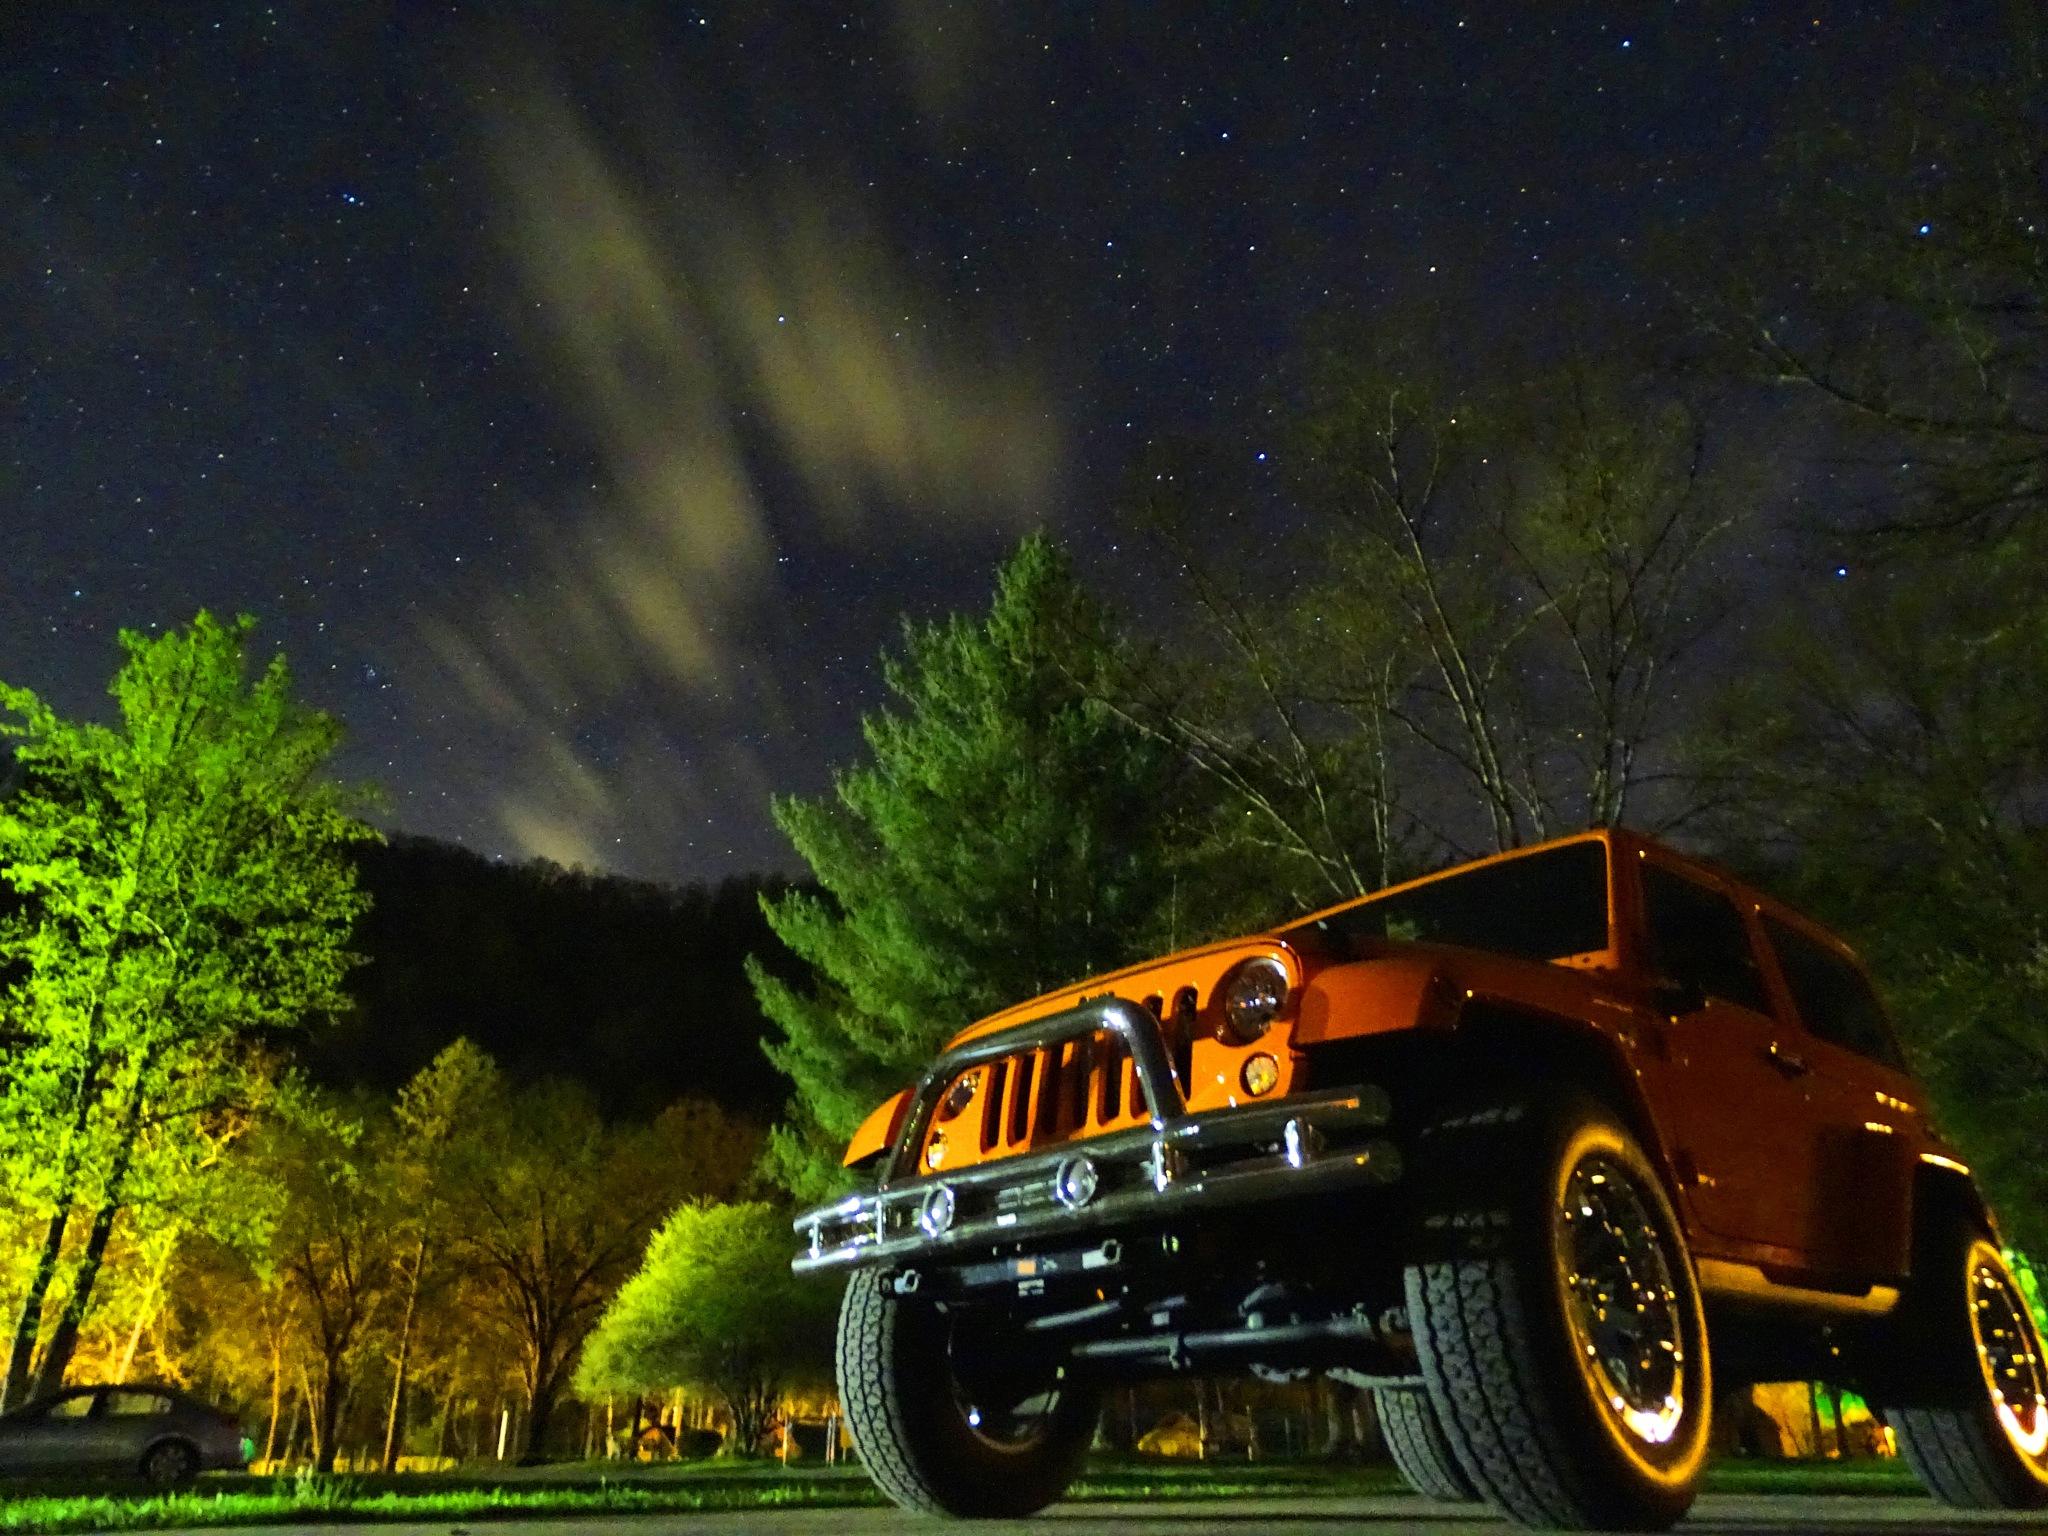 My Jeep by Patty Stockton